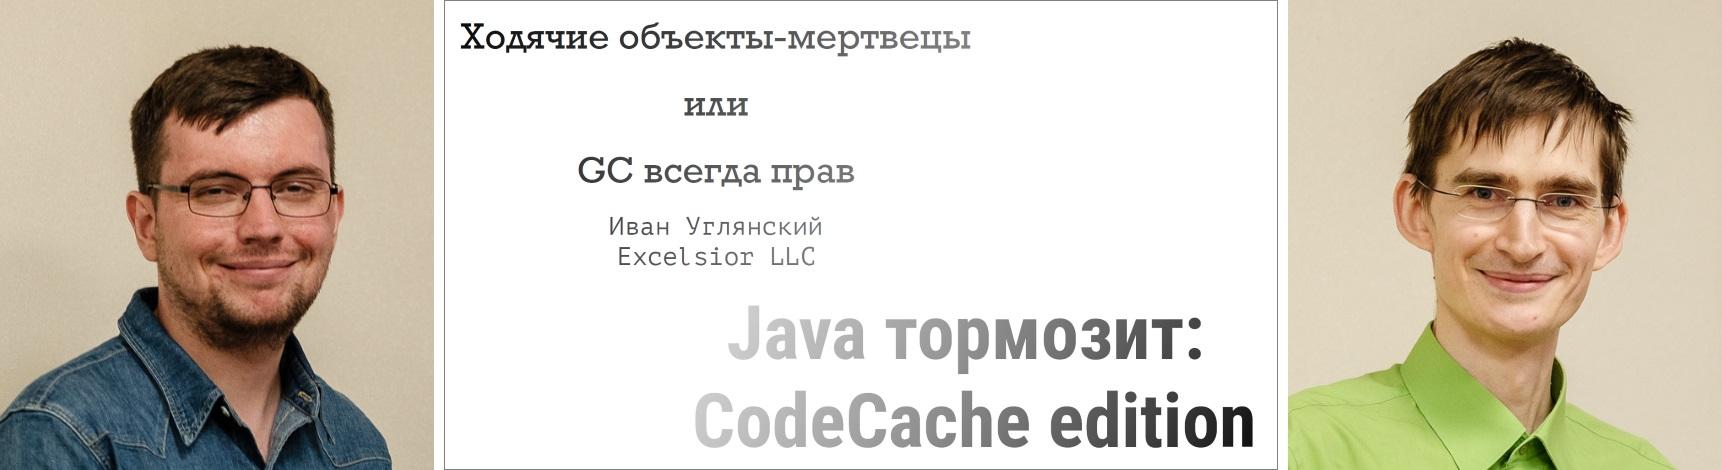 Иван Углянский и Владимир Ситников на jug.msk.ru - 1